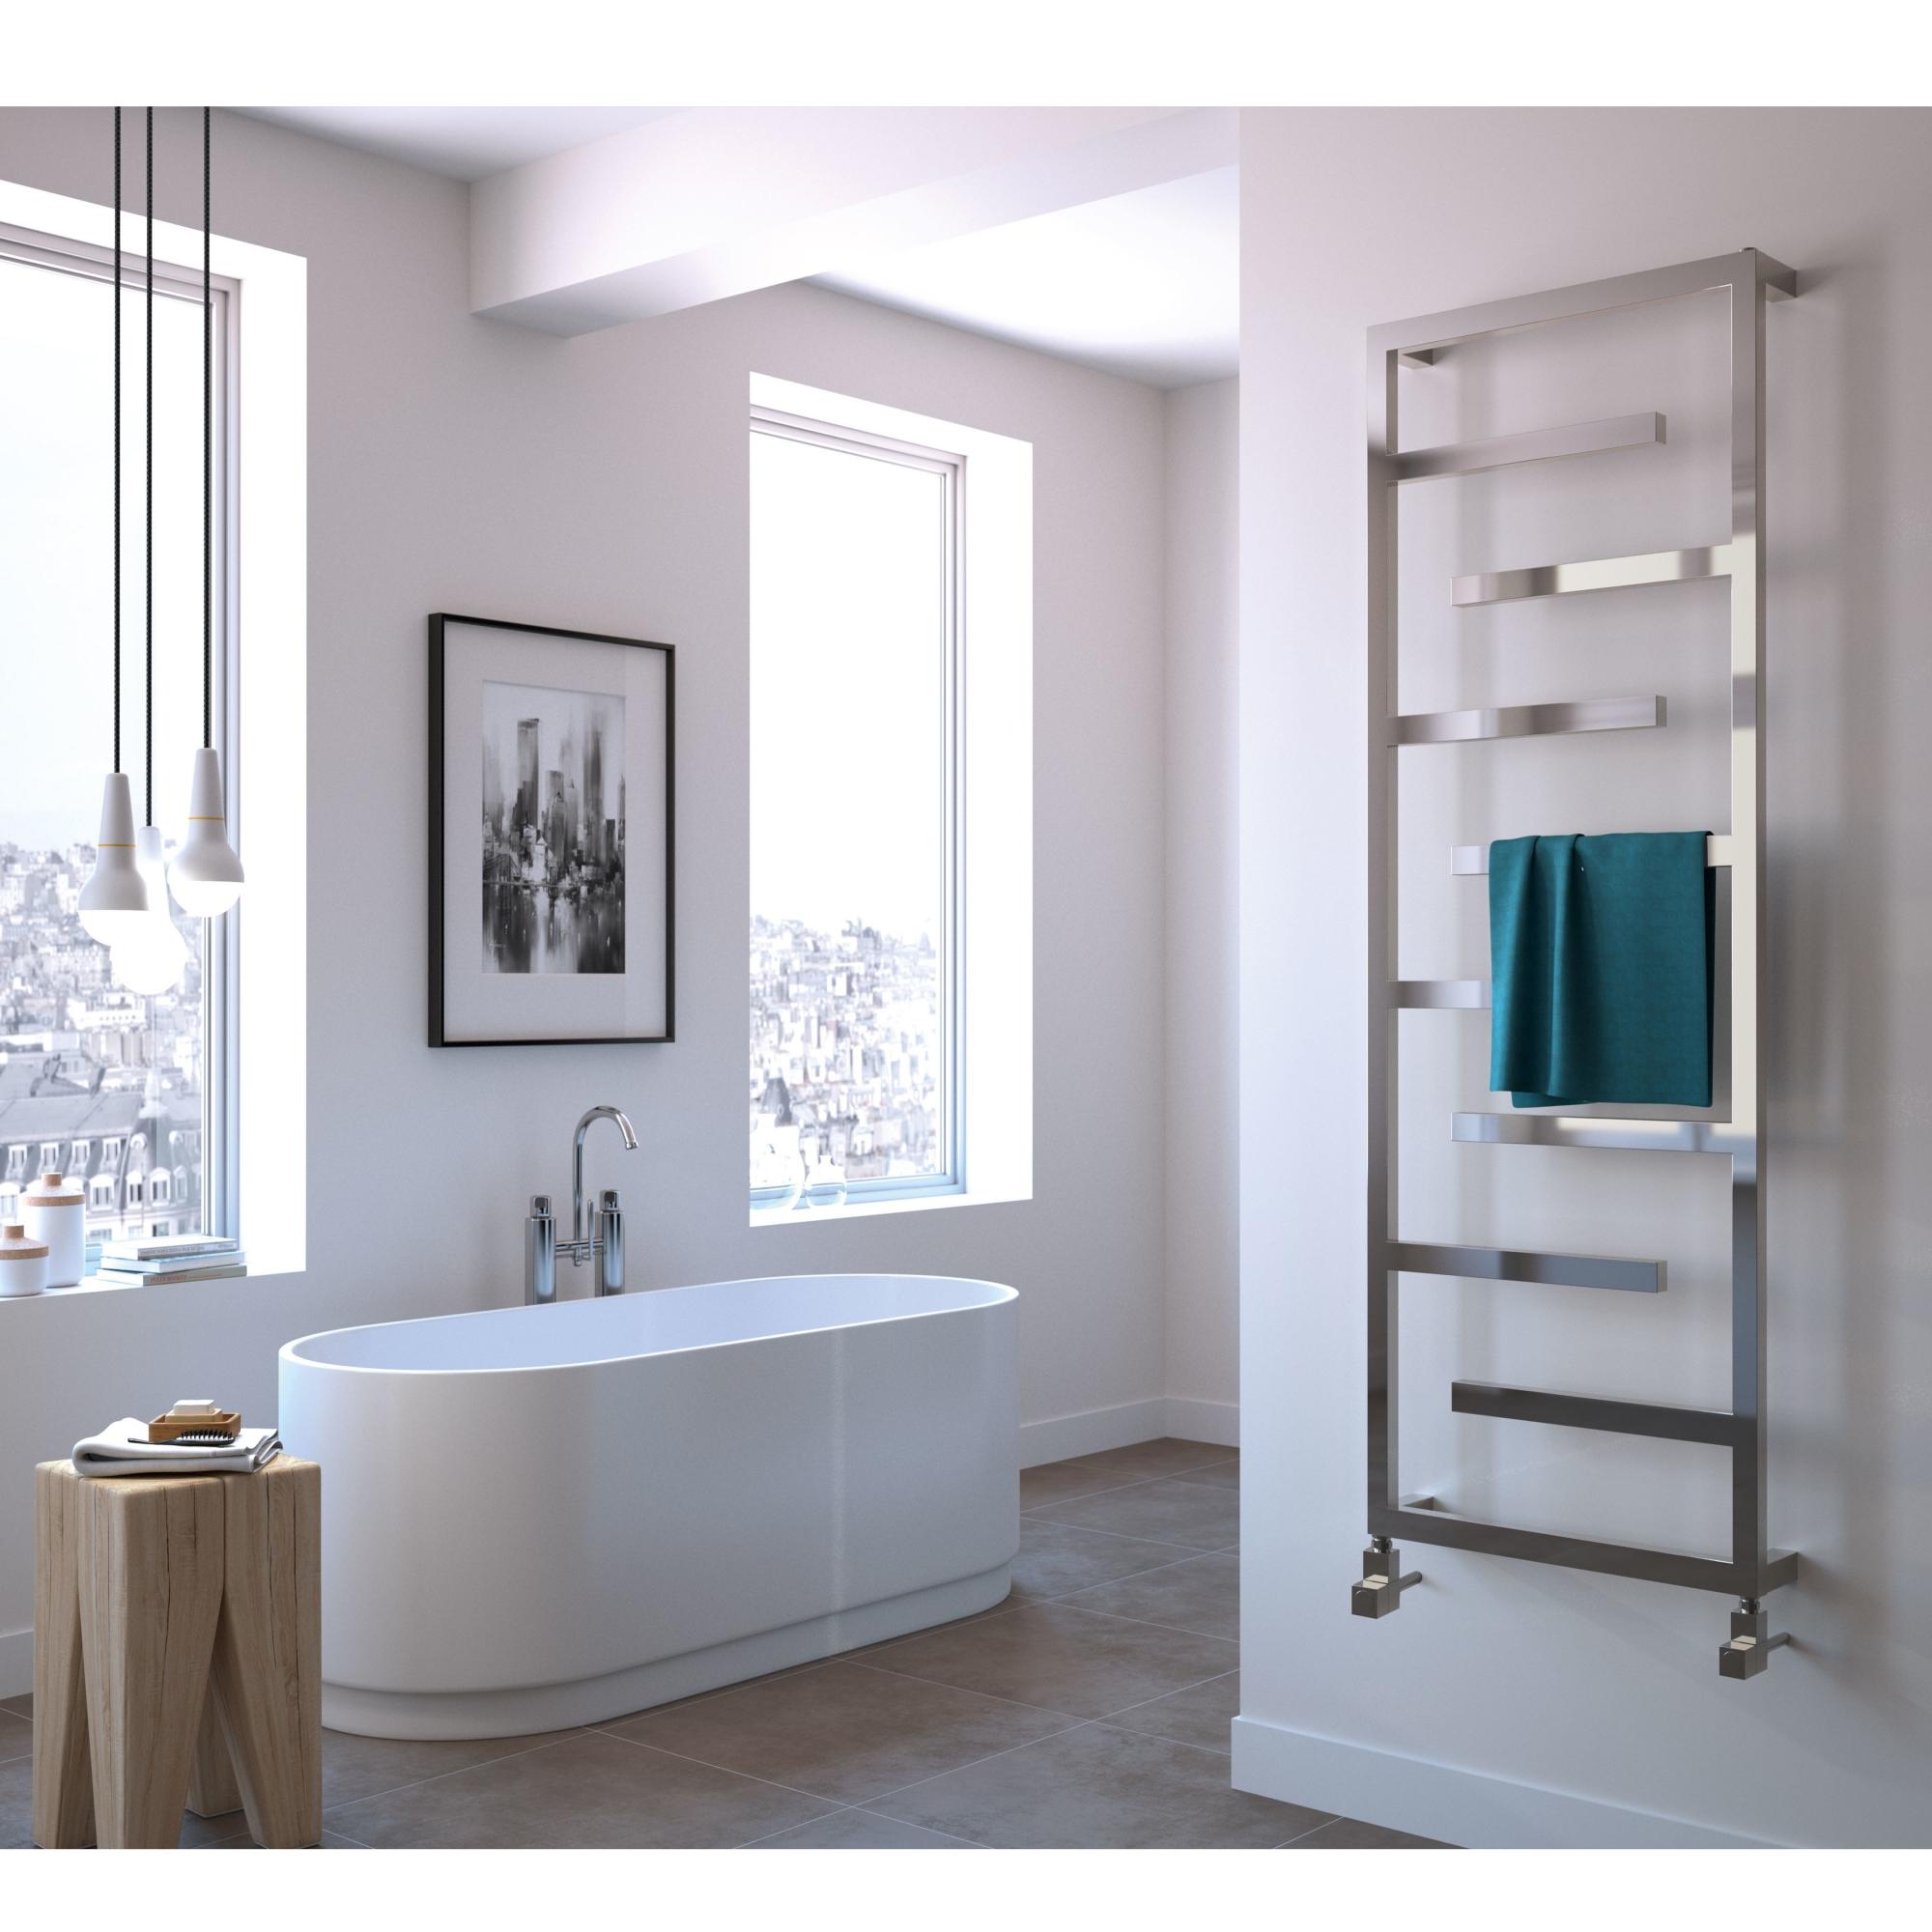 Radox Aztec Designer Heated Towel Rail 915mm H x 500mm W Chrome